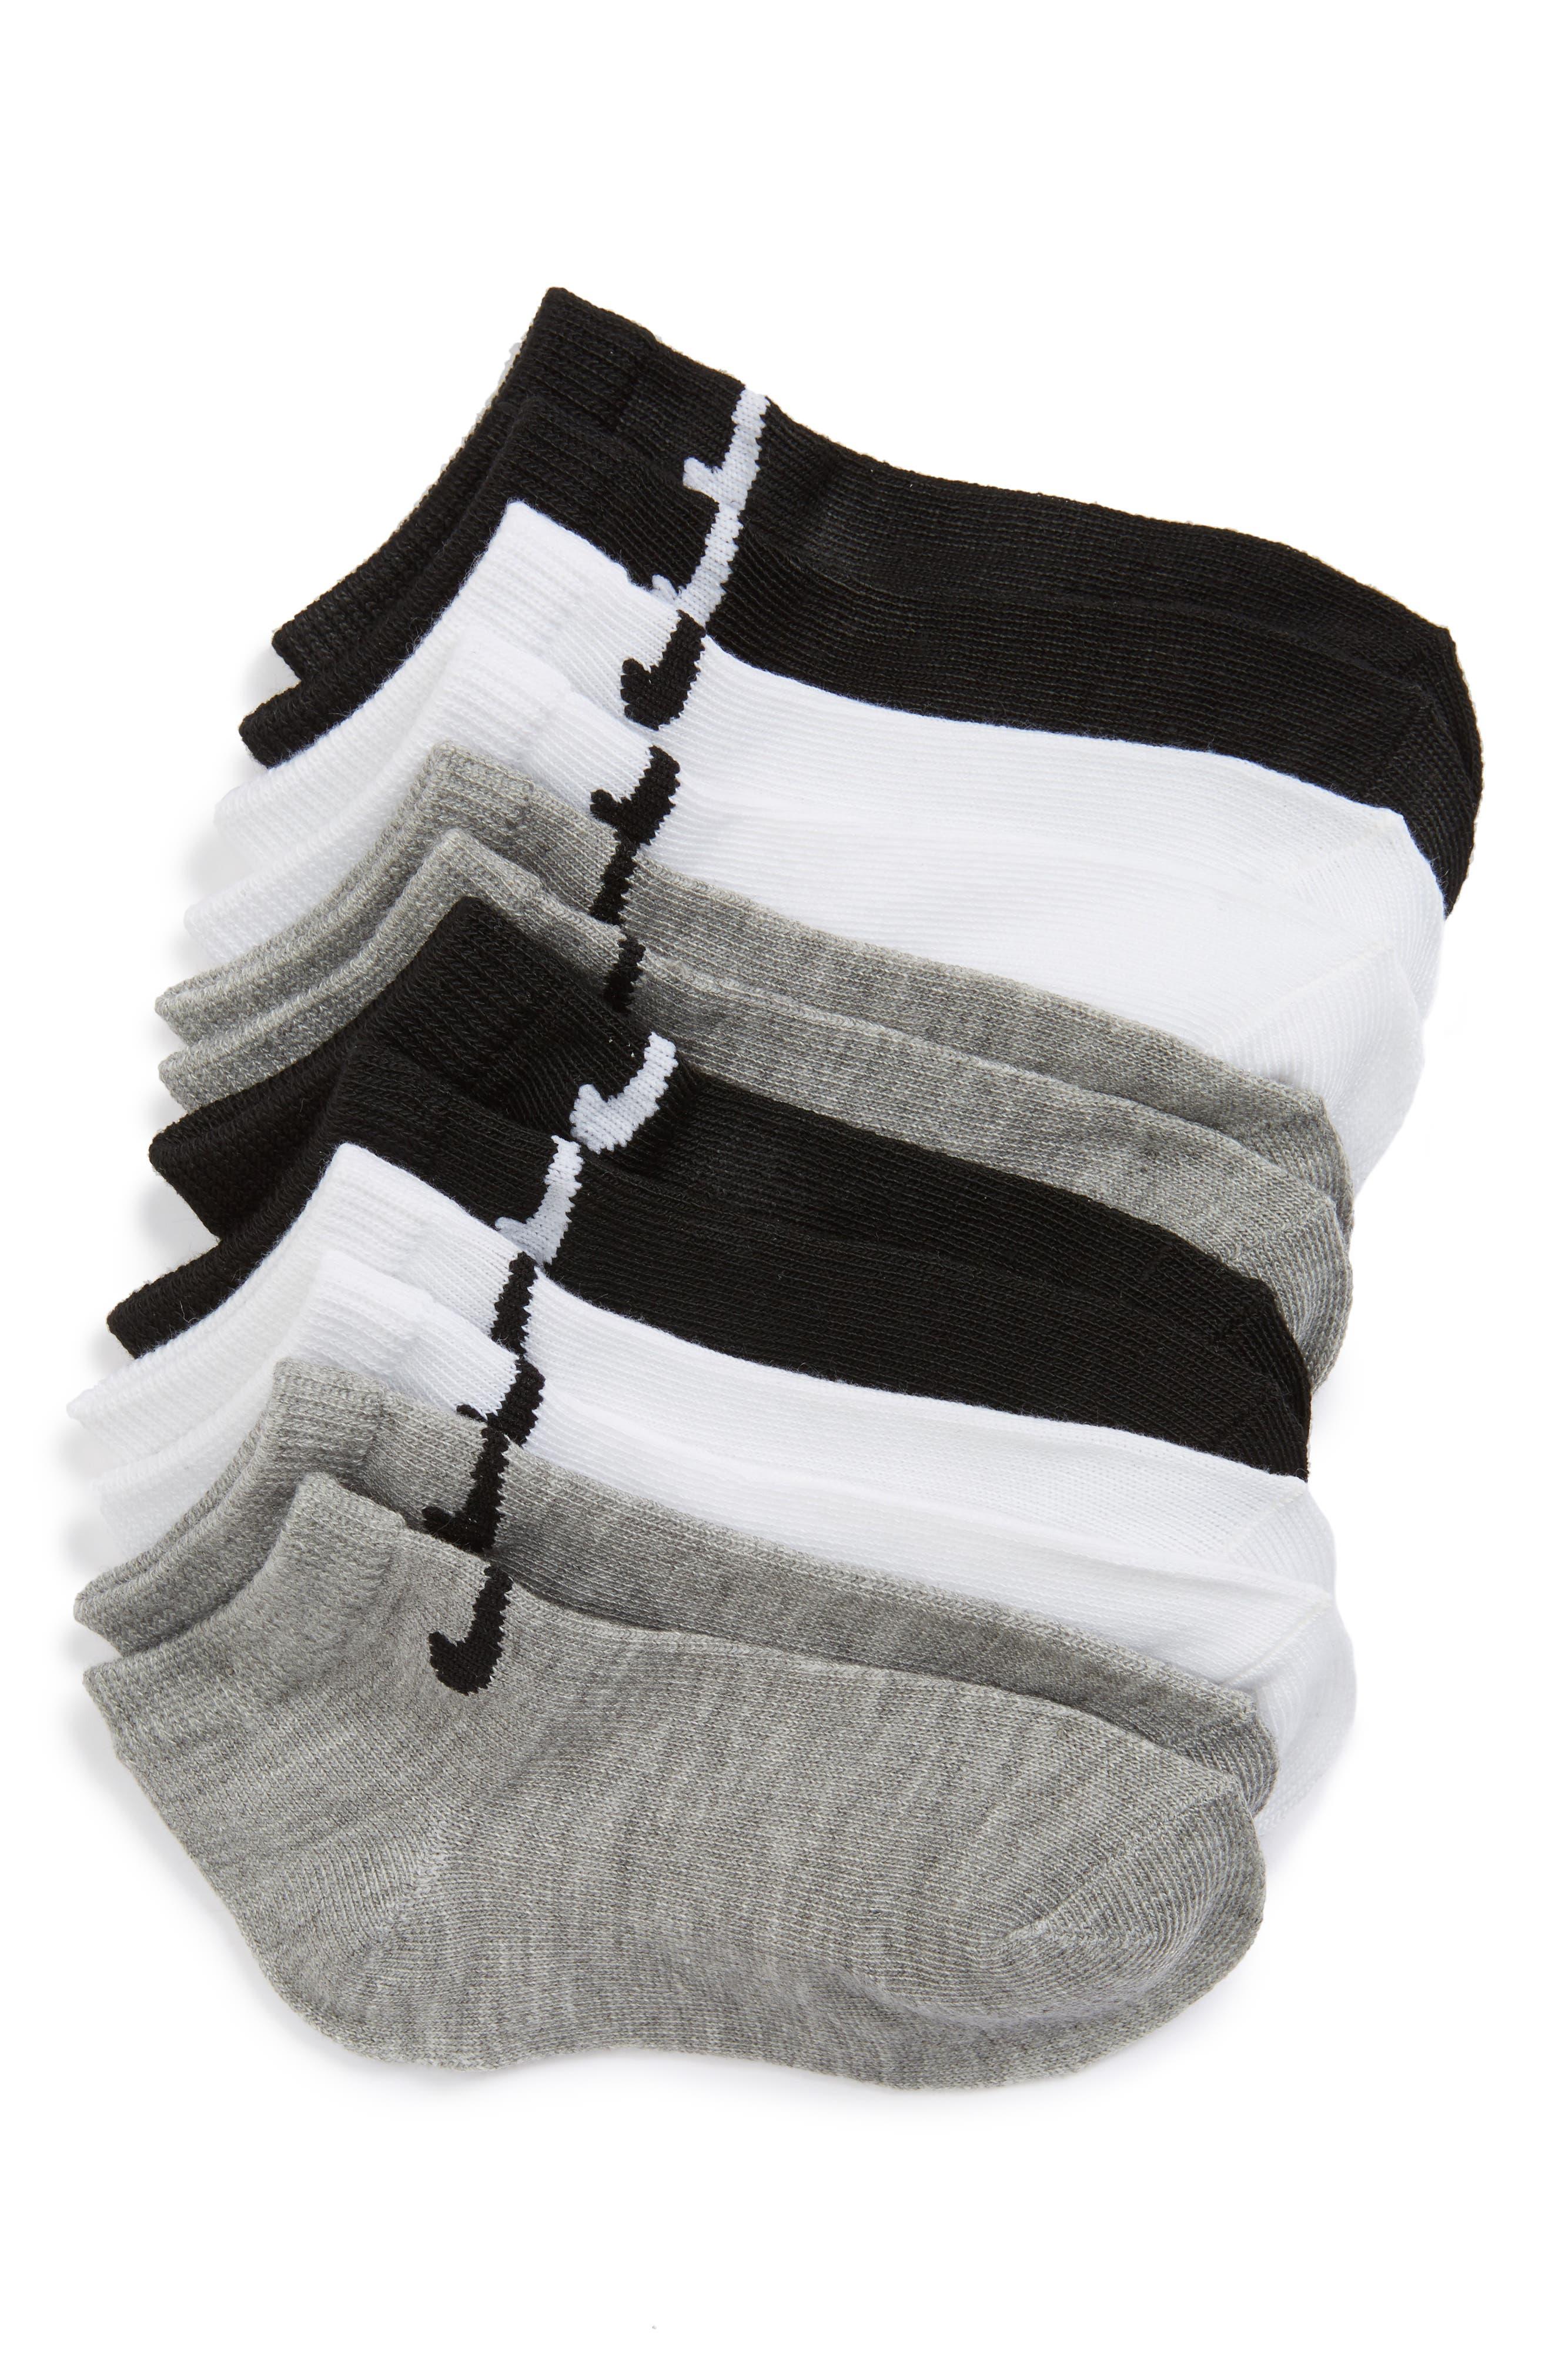 Nike Low Cut Performance Socks (6-Pack) (Toddler & Little Kid)